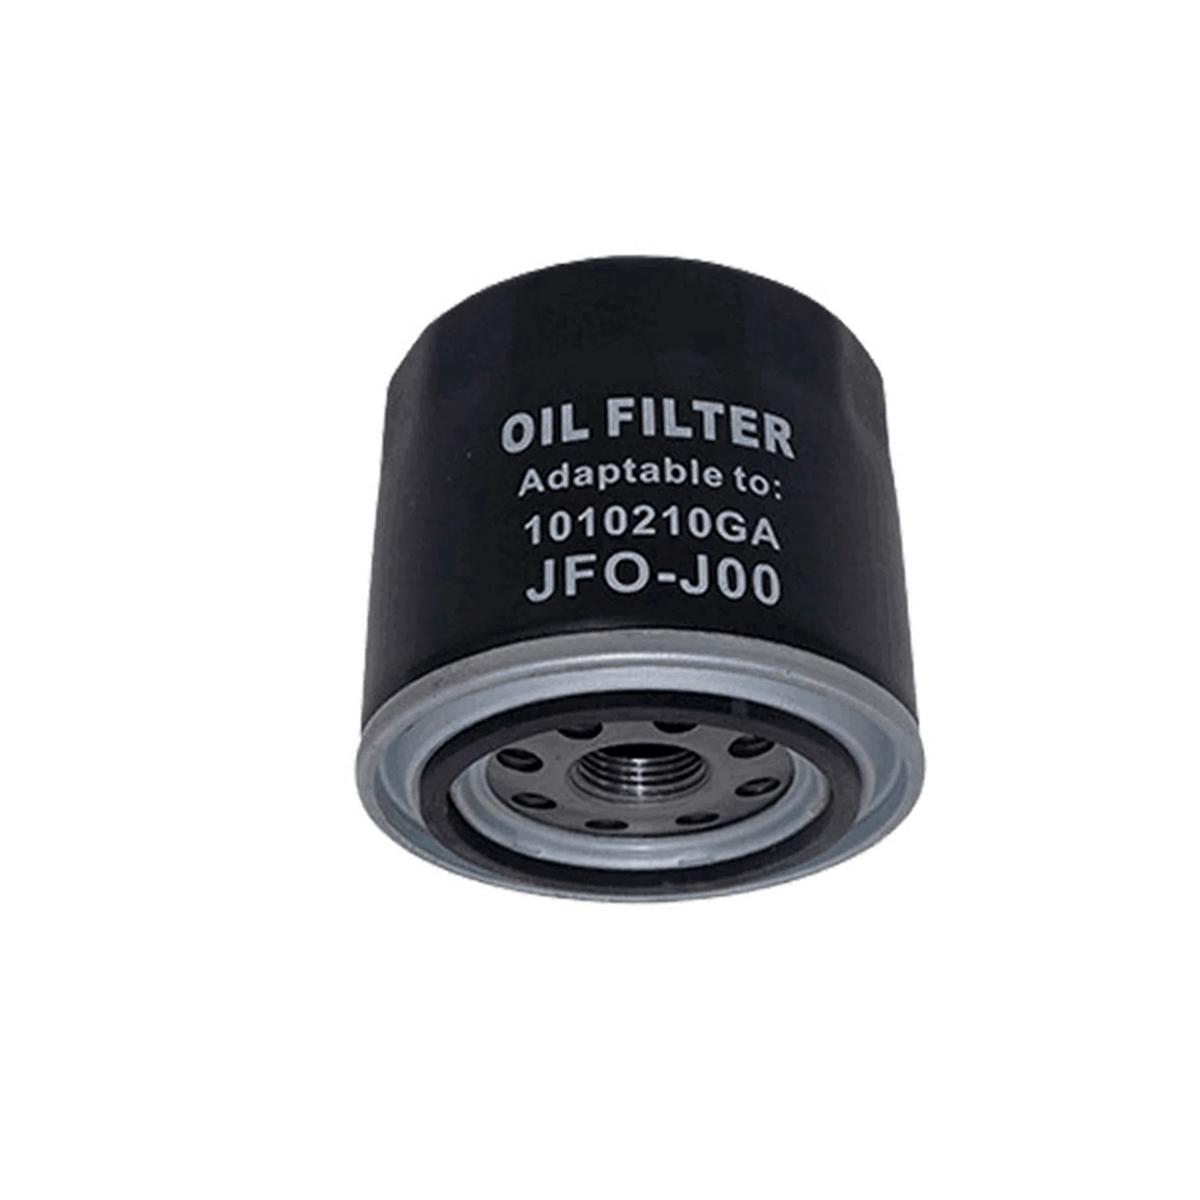 Filtro de Oleo Wega JFO0J00 / Tecfil PSL151 em até 6x sem juros